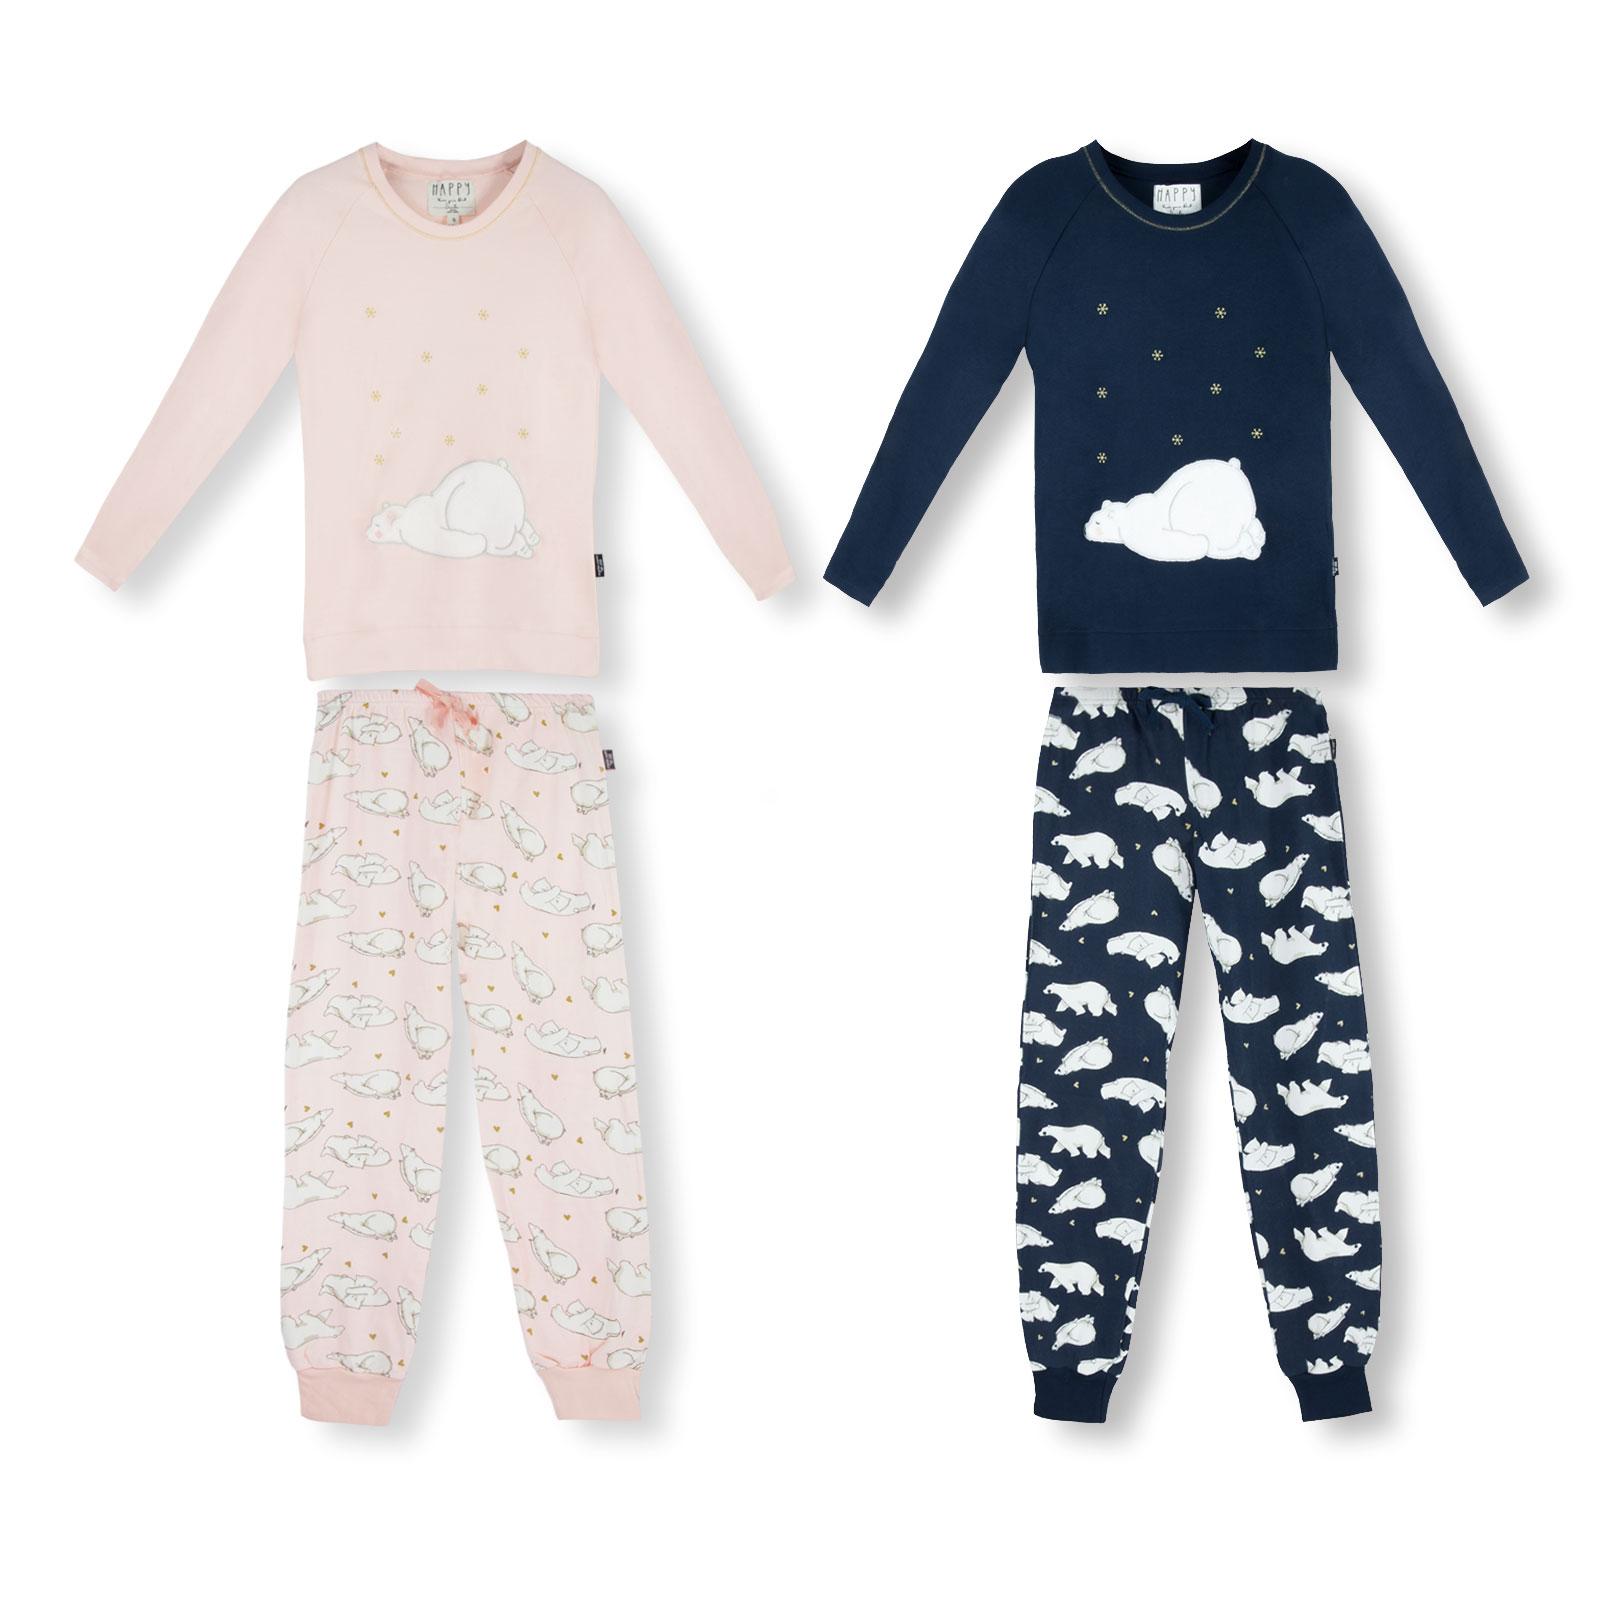 HAPPY PEOPLE Damen Pyjama Set Schlafanzug langarm Eisberg S M L XL